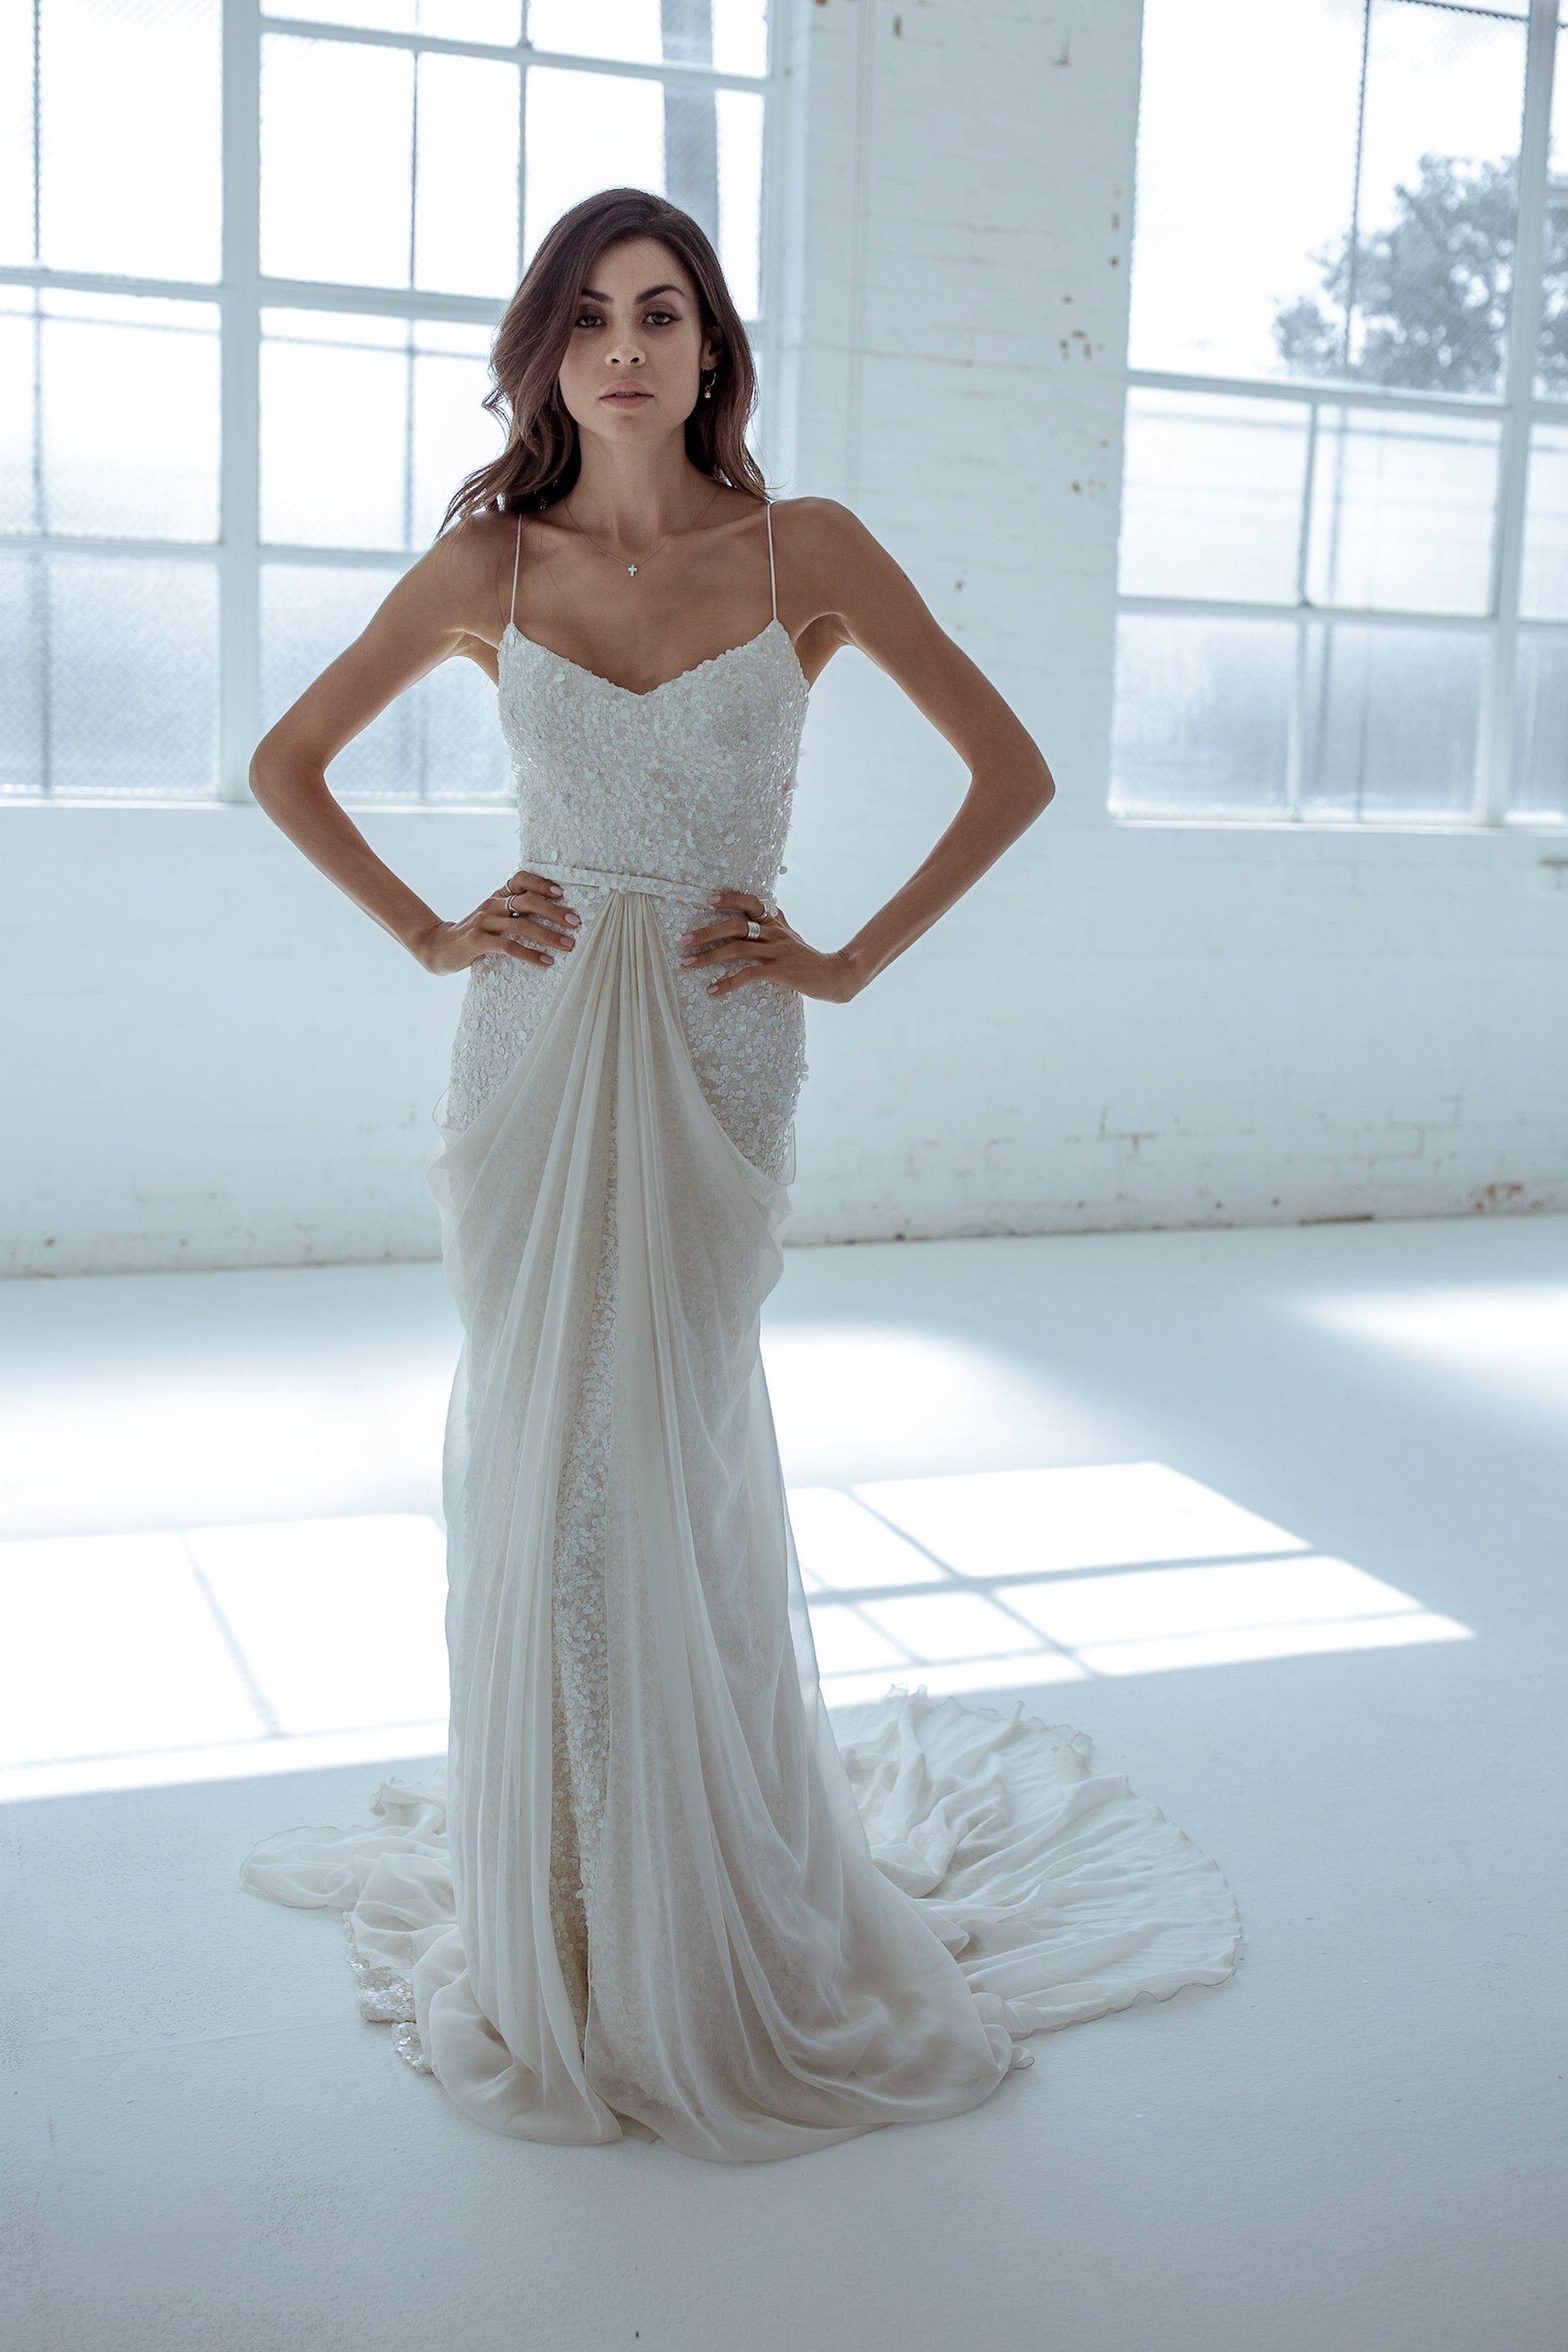 Genevieve Skirt Overlay   Boutique   Pinterest   Karen willis holmes ...